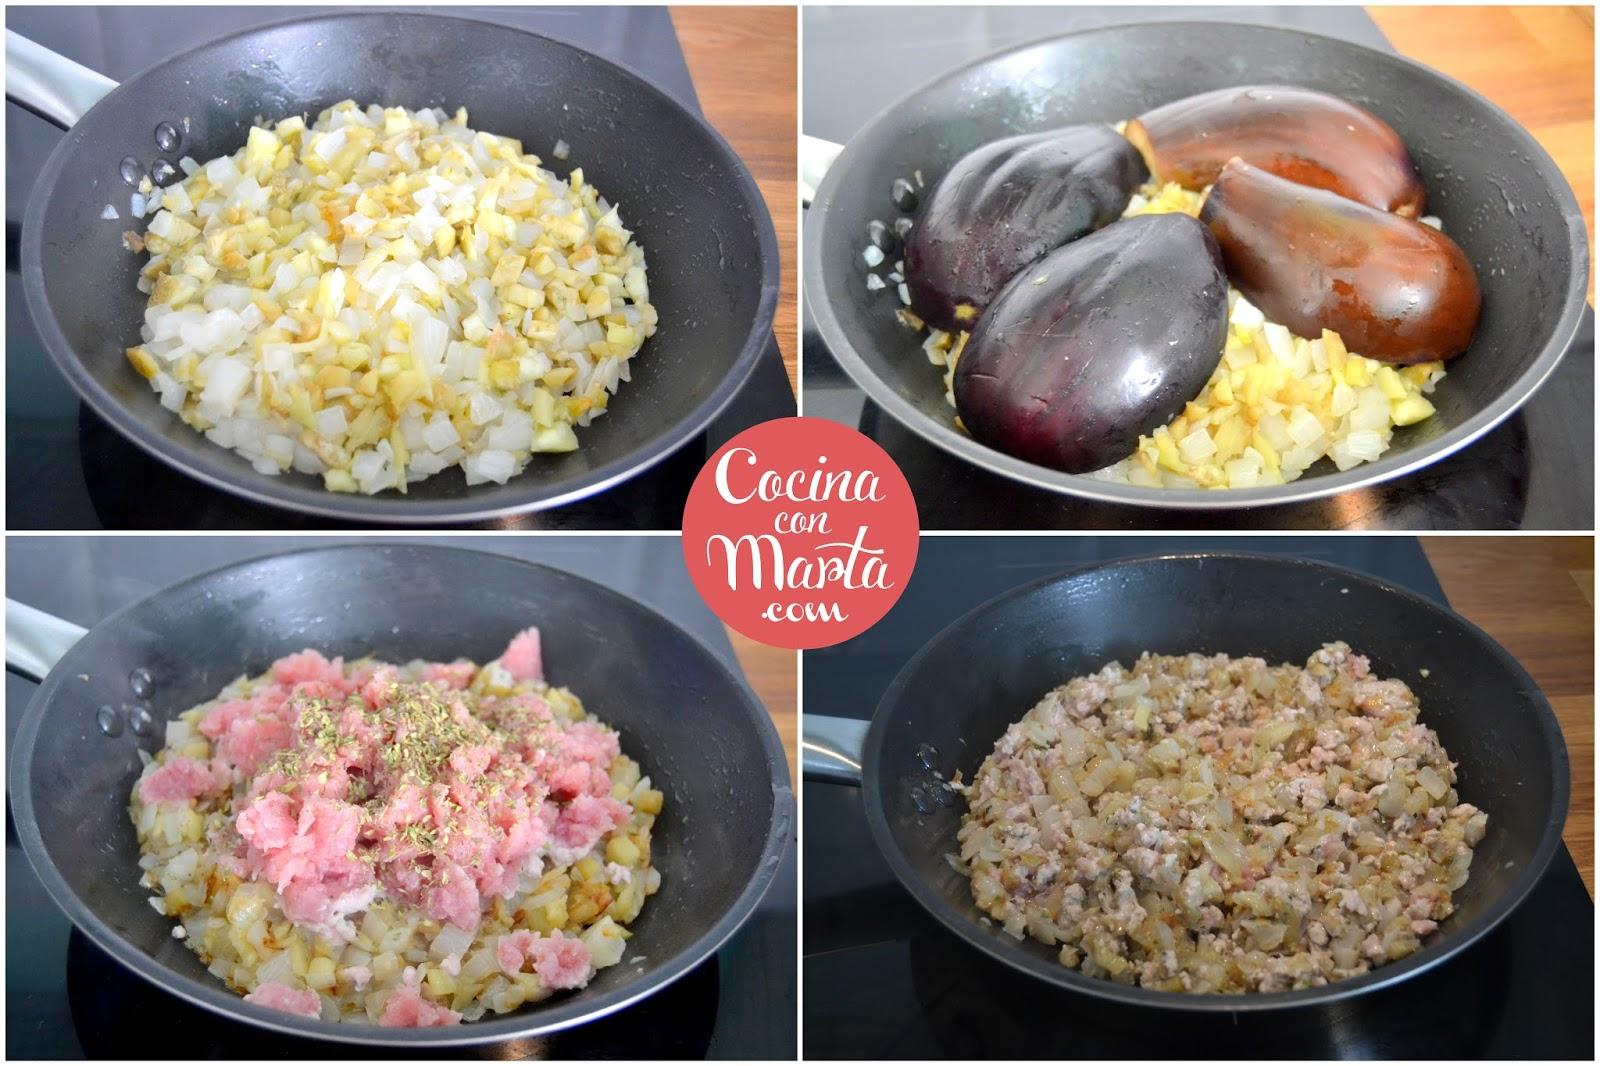 Berenjenas rellenas de carne for Cocina berenjenas rellenas